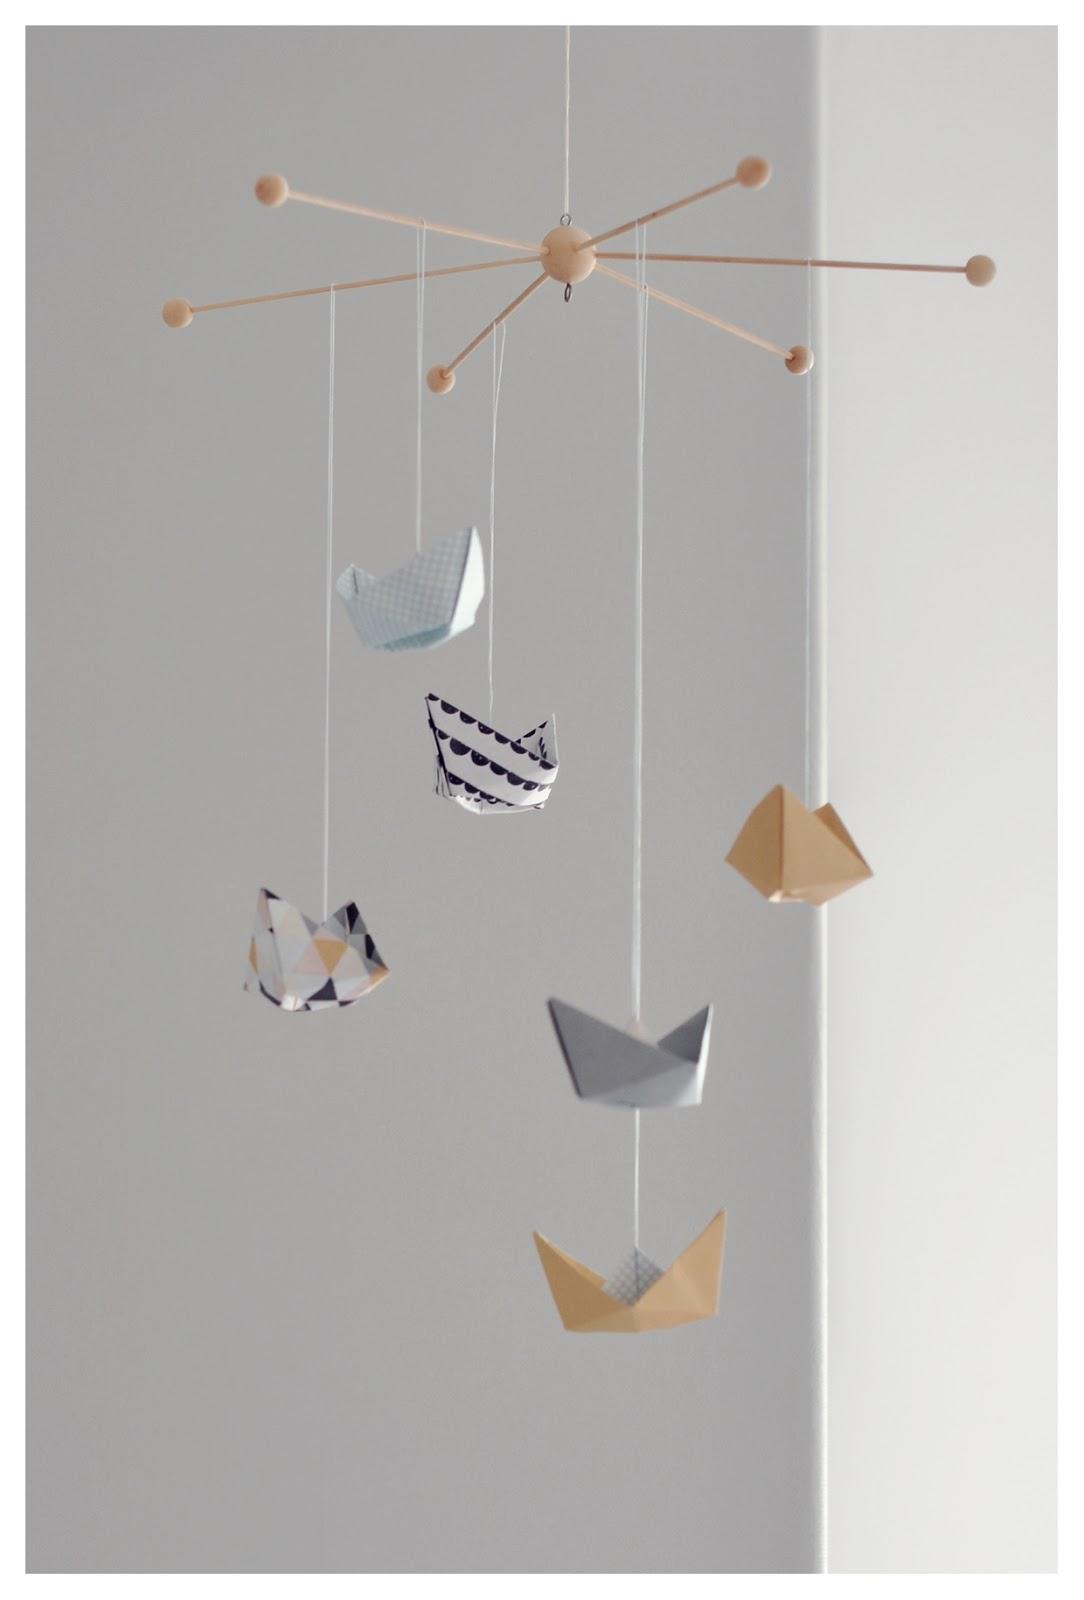 herzschmiede diy mobile im nordic style. Black Bedroom Furniture Sets. Home Design Ideas